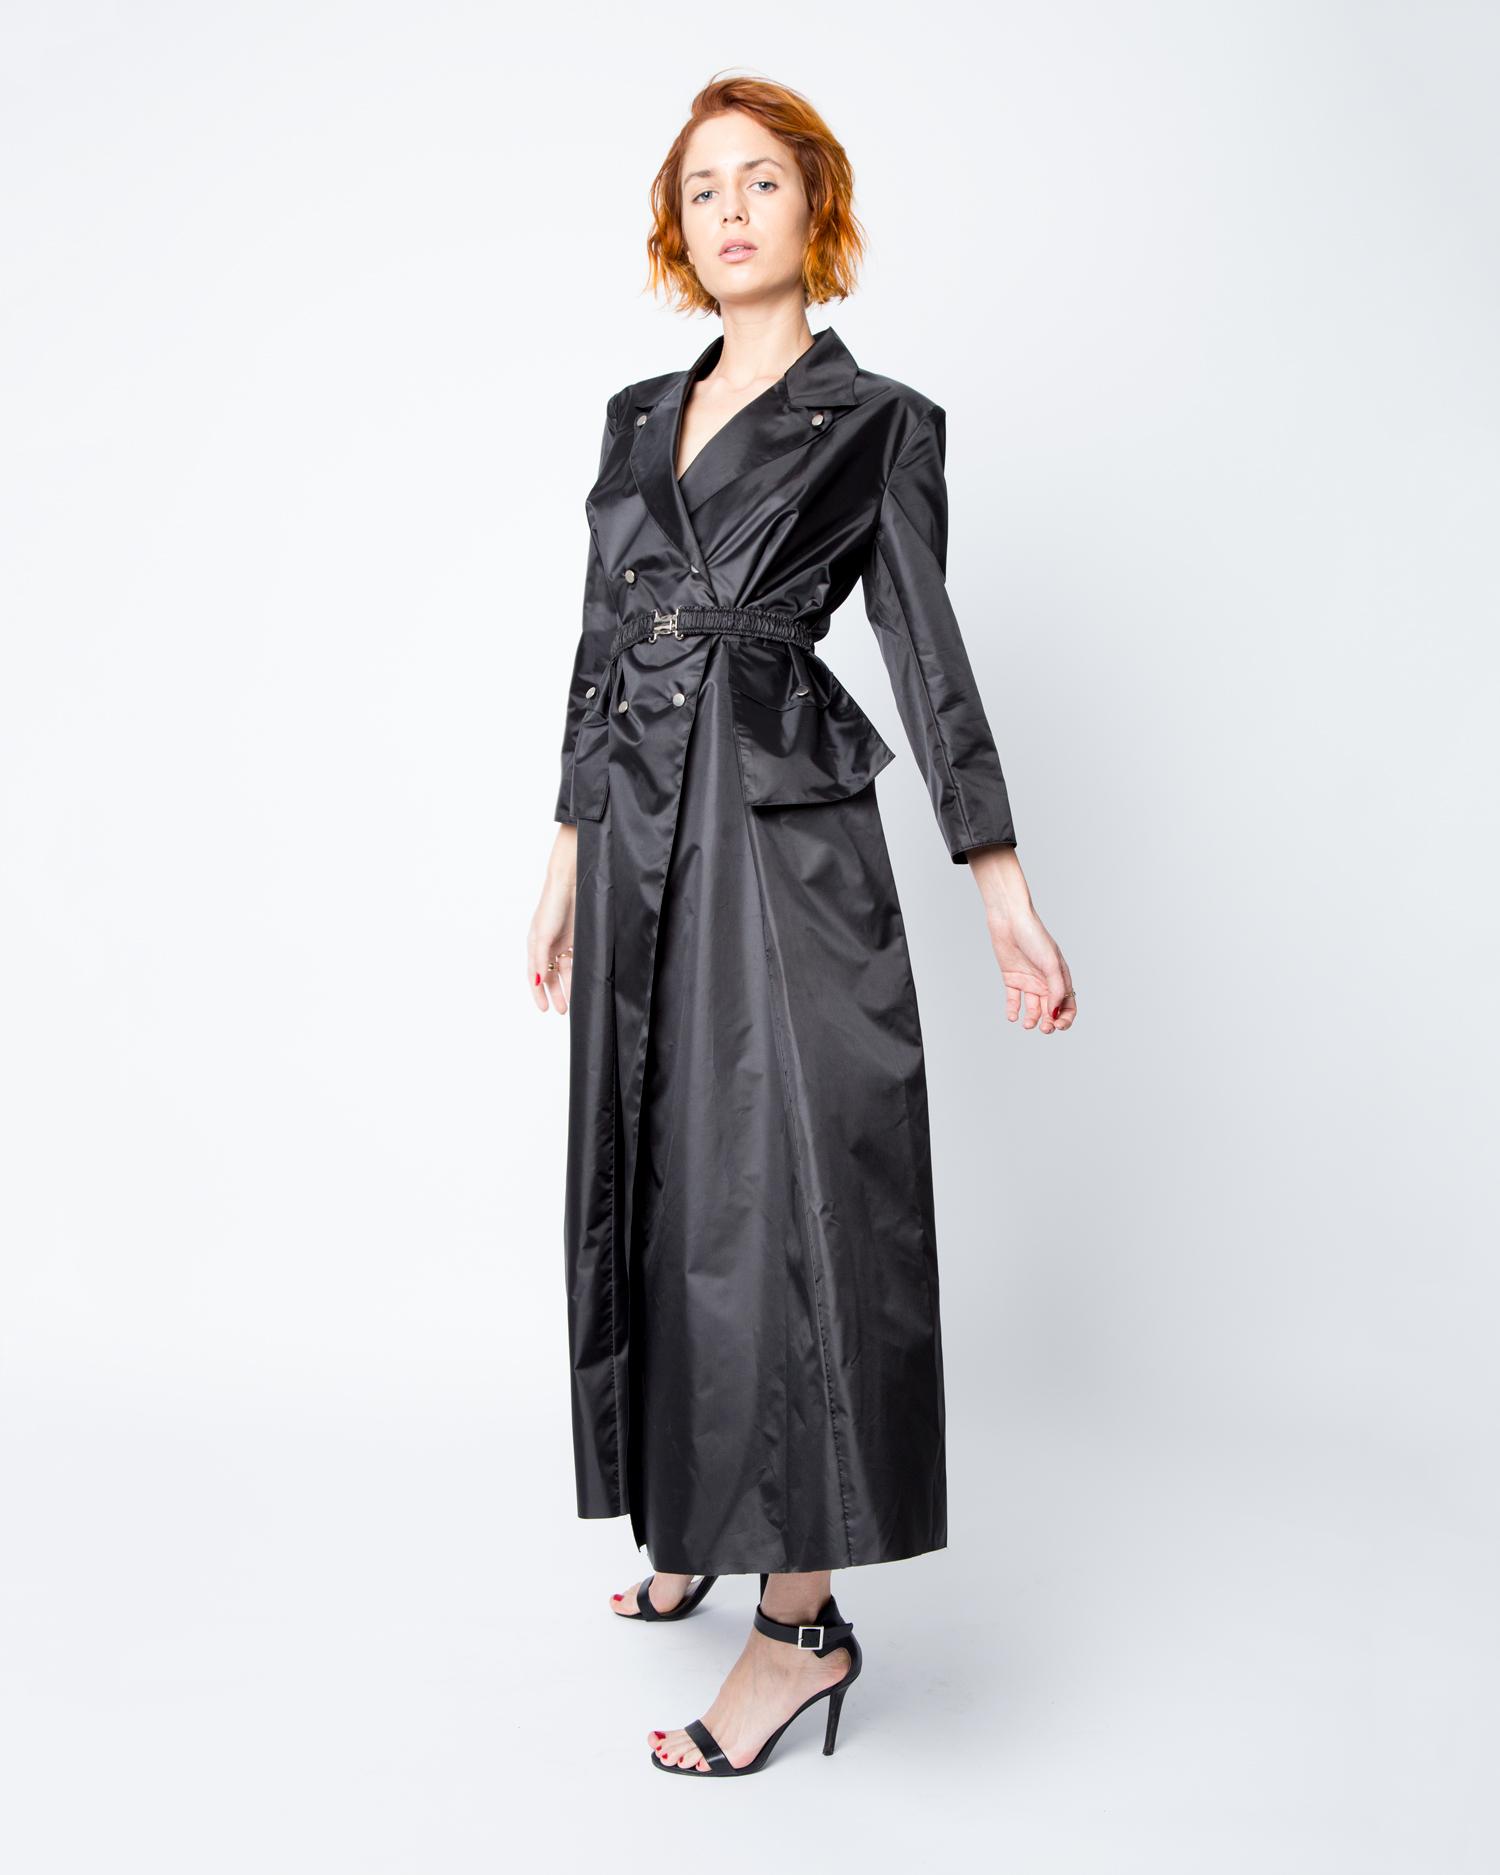 olya-kosterina-ss18-trench-dress-03.jpg